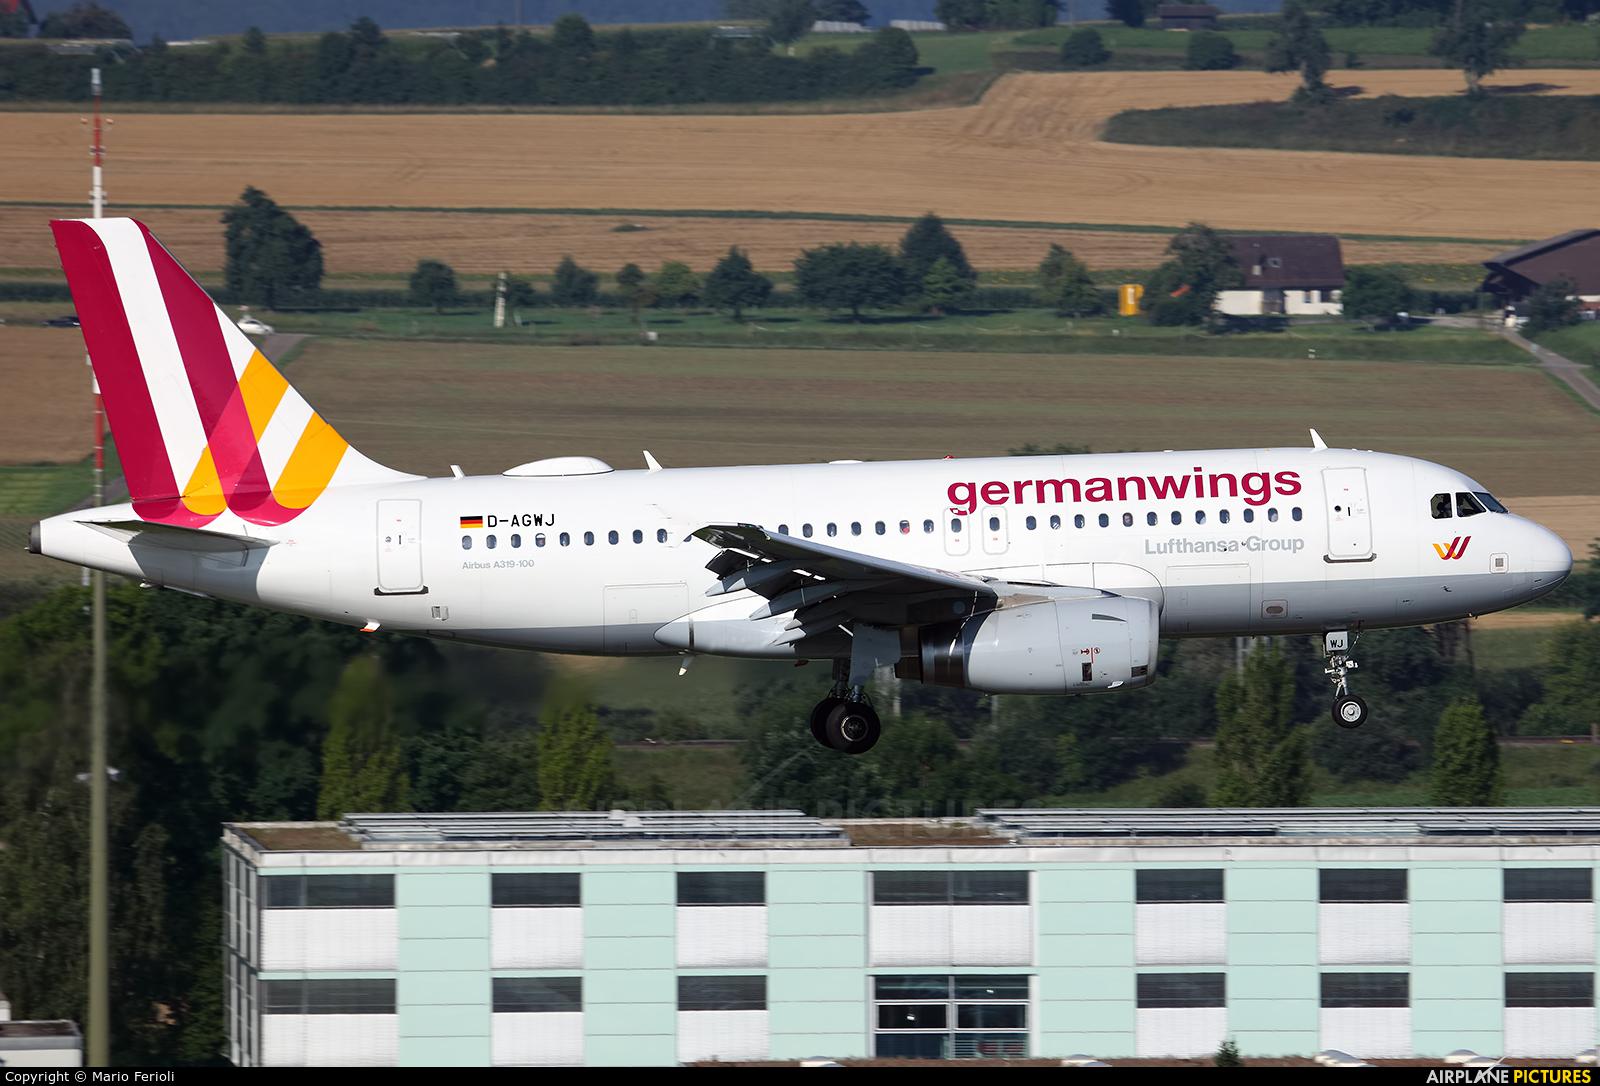 Germanwings D-AGWJ aircraft at Zurich